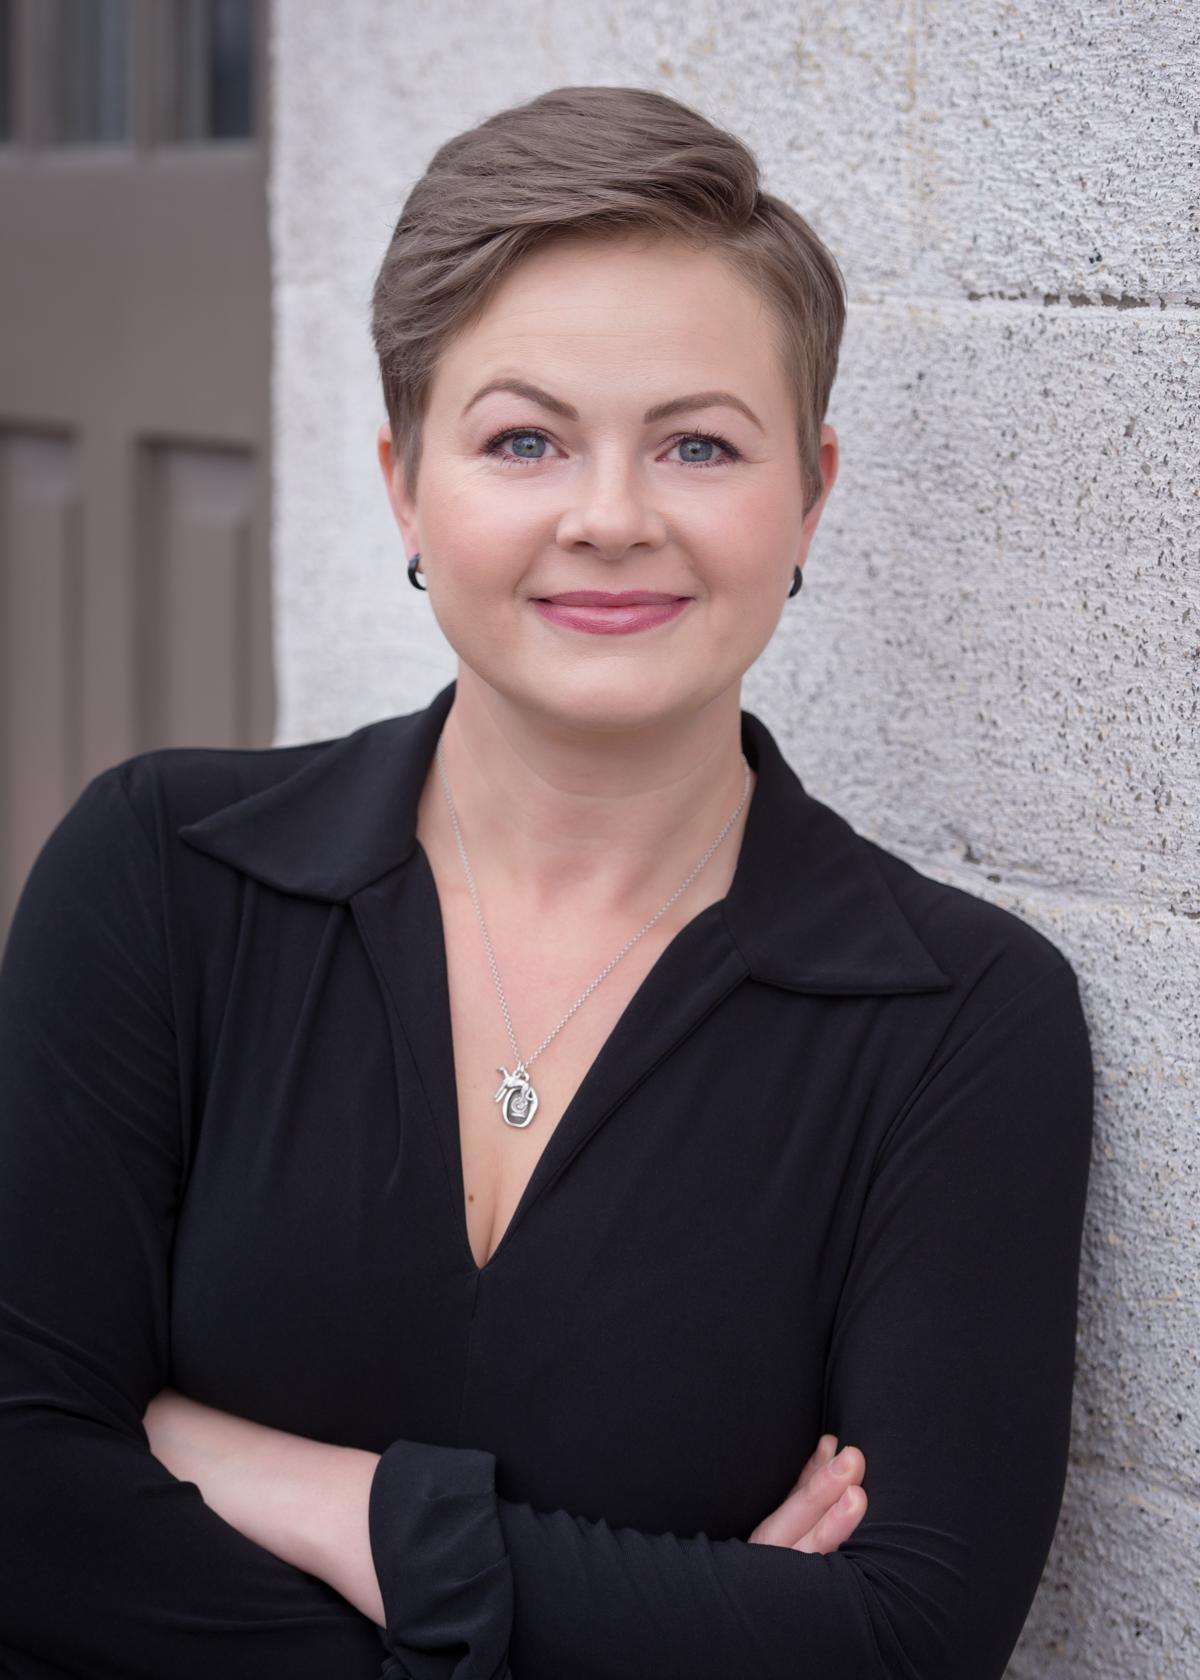 Mary Jewers